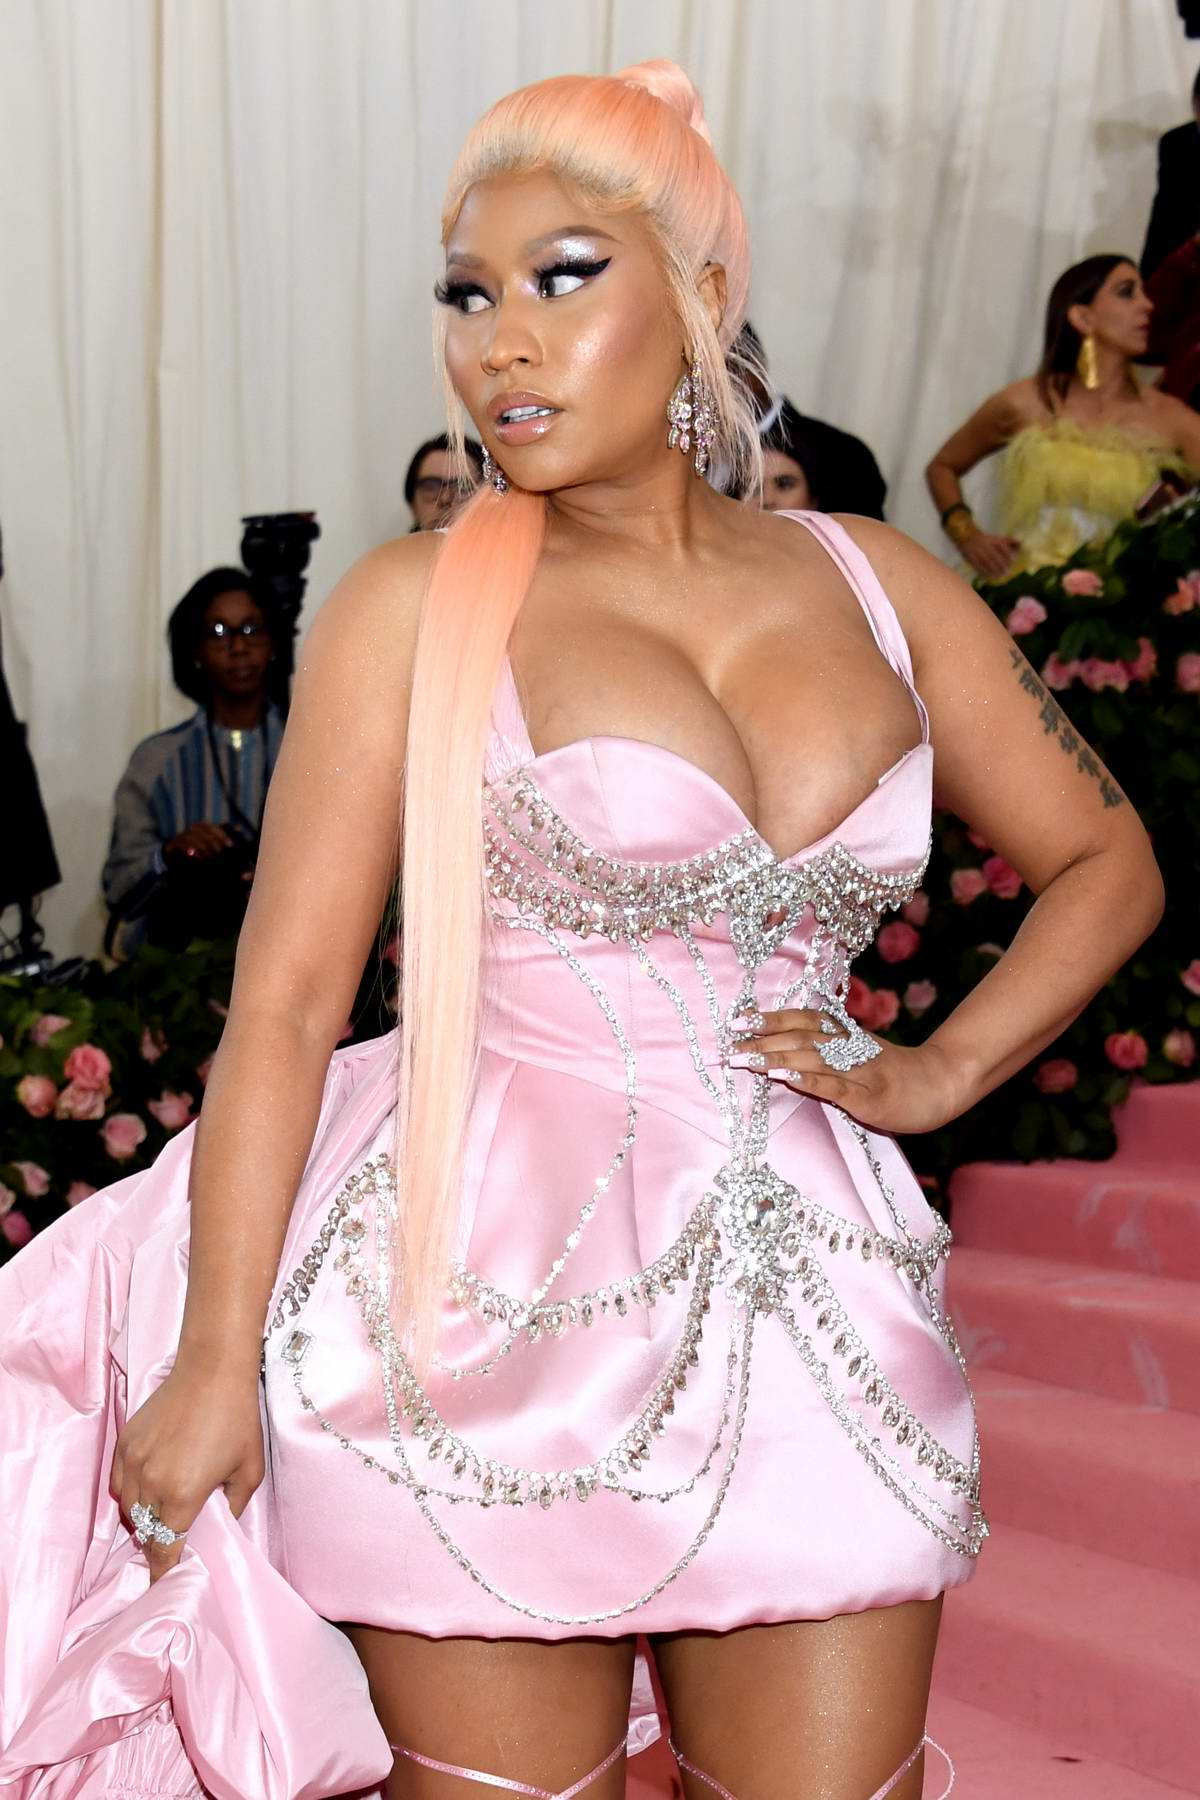 Nicki Minaj attends The 2019 Met Gala Celebrating Camp: Notes on Fashion in New York City